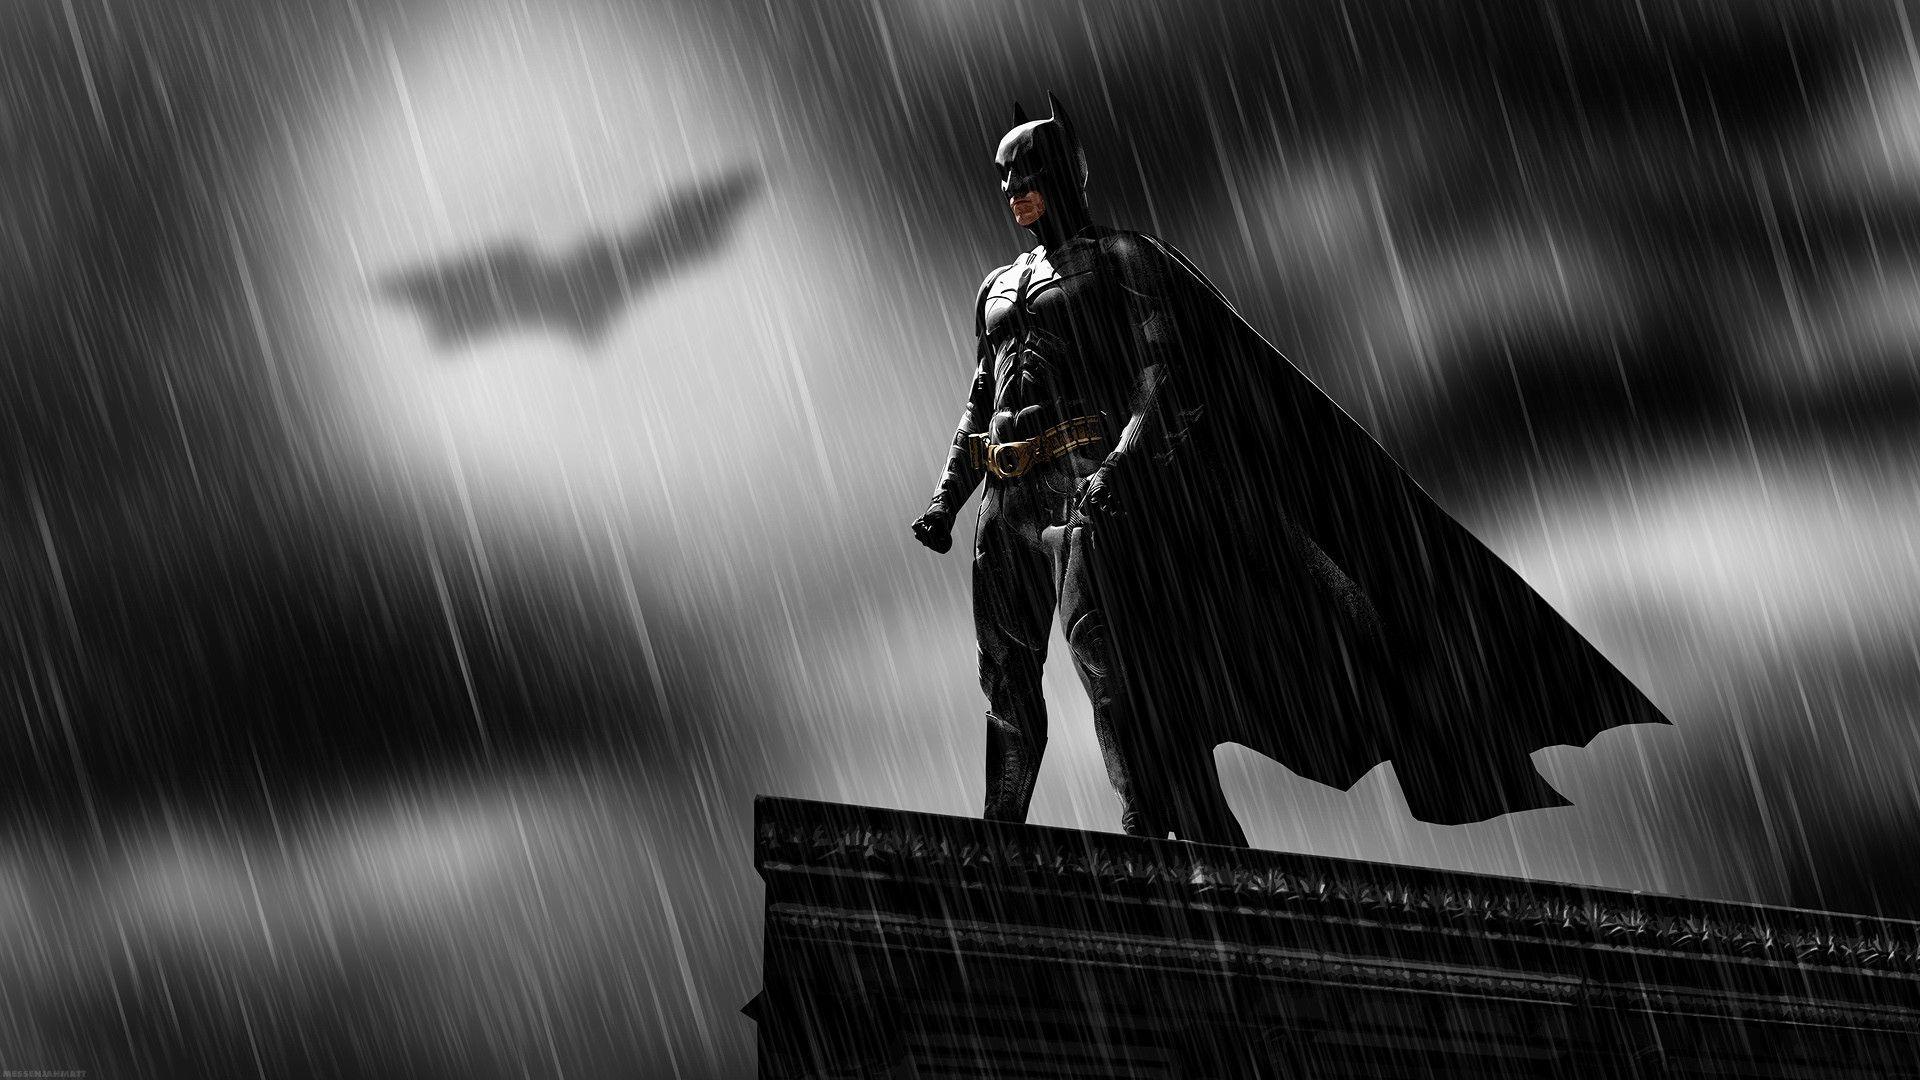 1920x1080 Batman Wallpapers Hd Free Download Batman Wallpaper Dark Knight Wallpaper Hd Batman Wallpaper